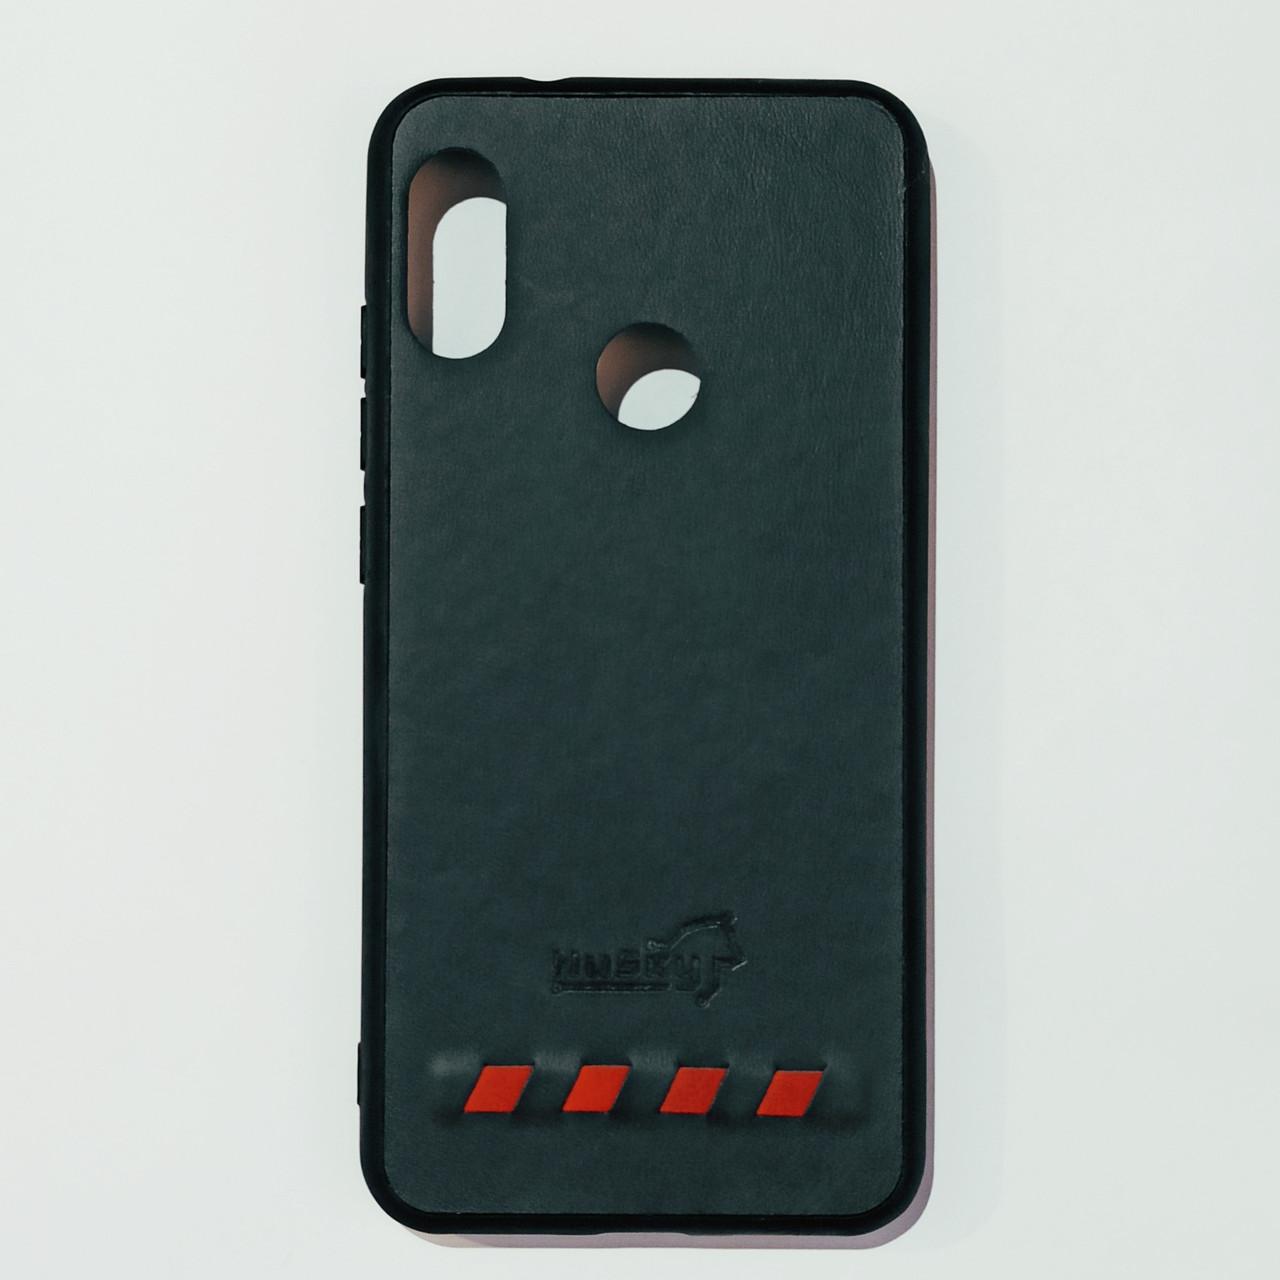 Бампер для Xiaomi A2 Lite, Redmi 6 Pro Черно-Синий